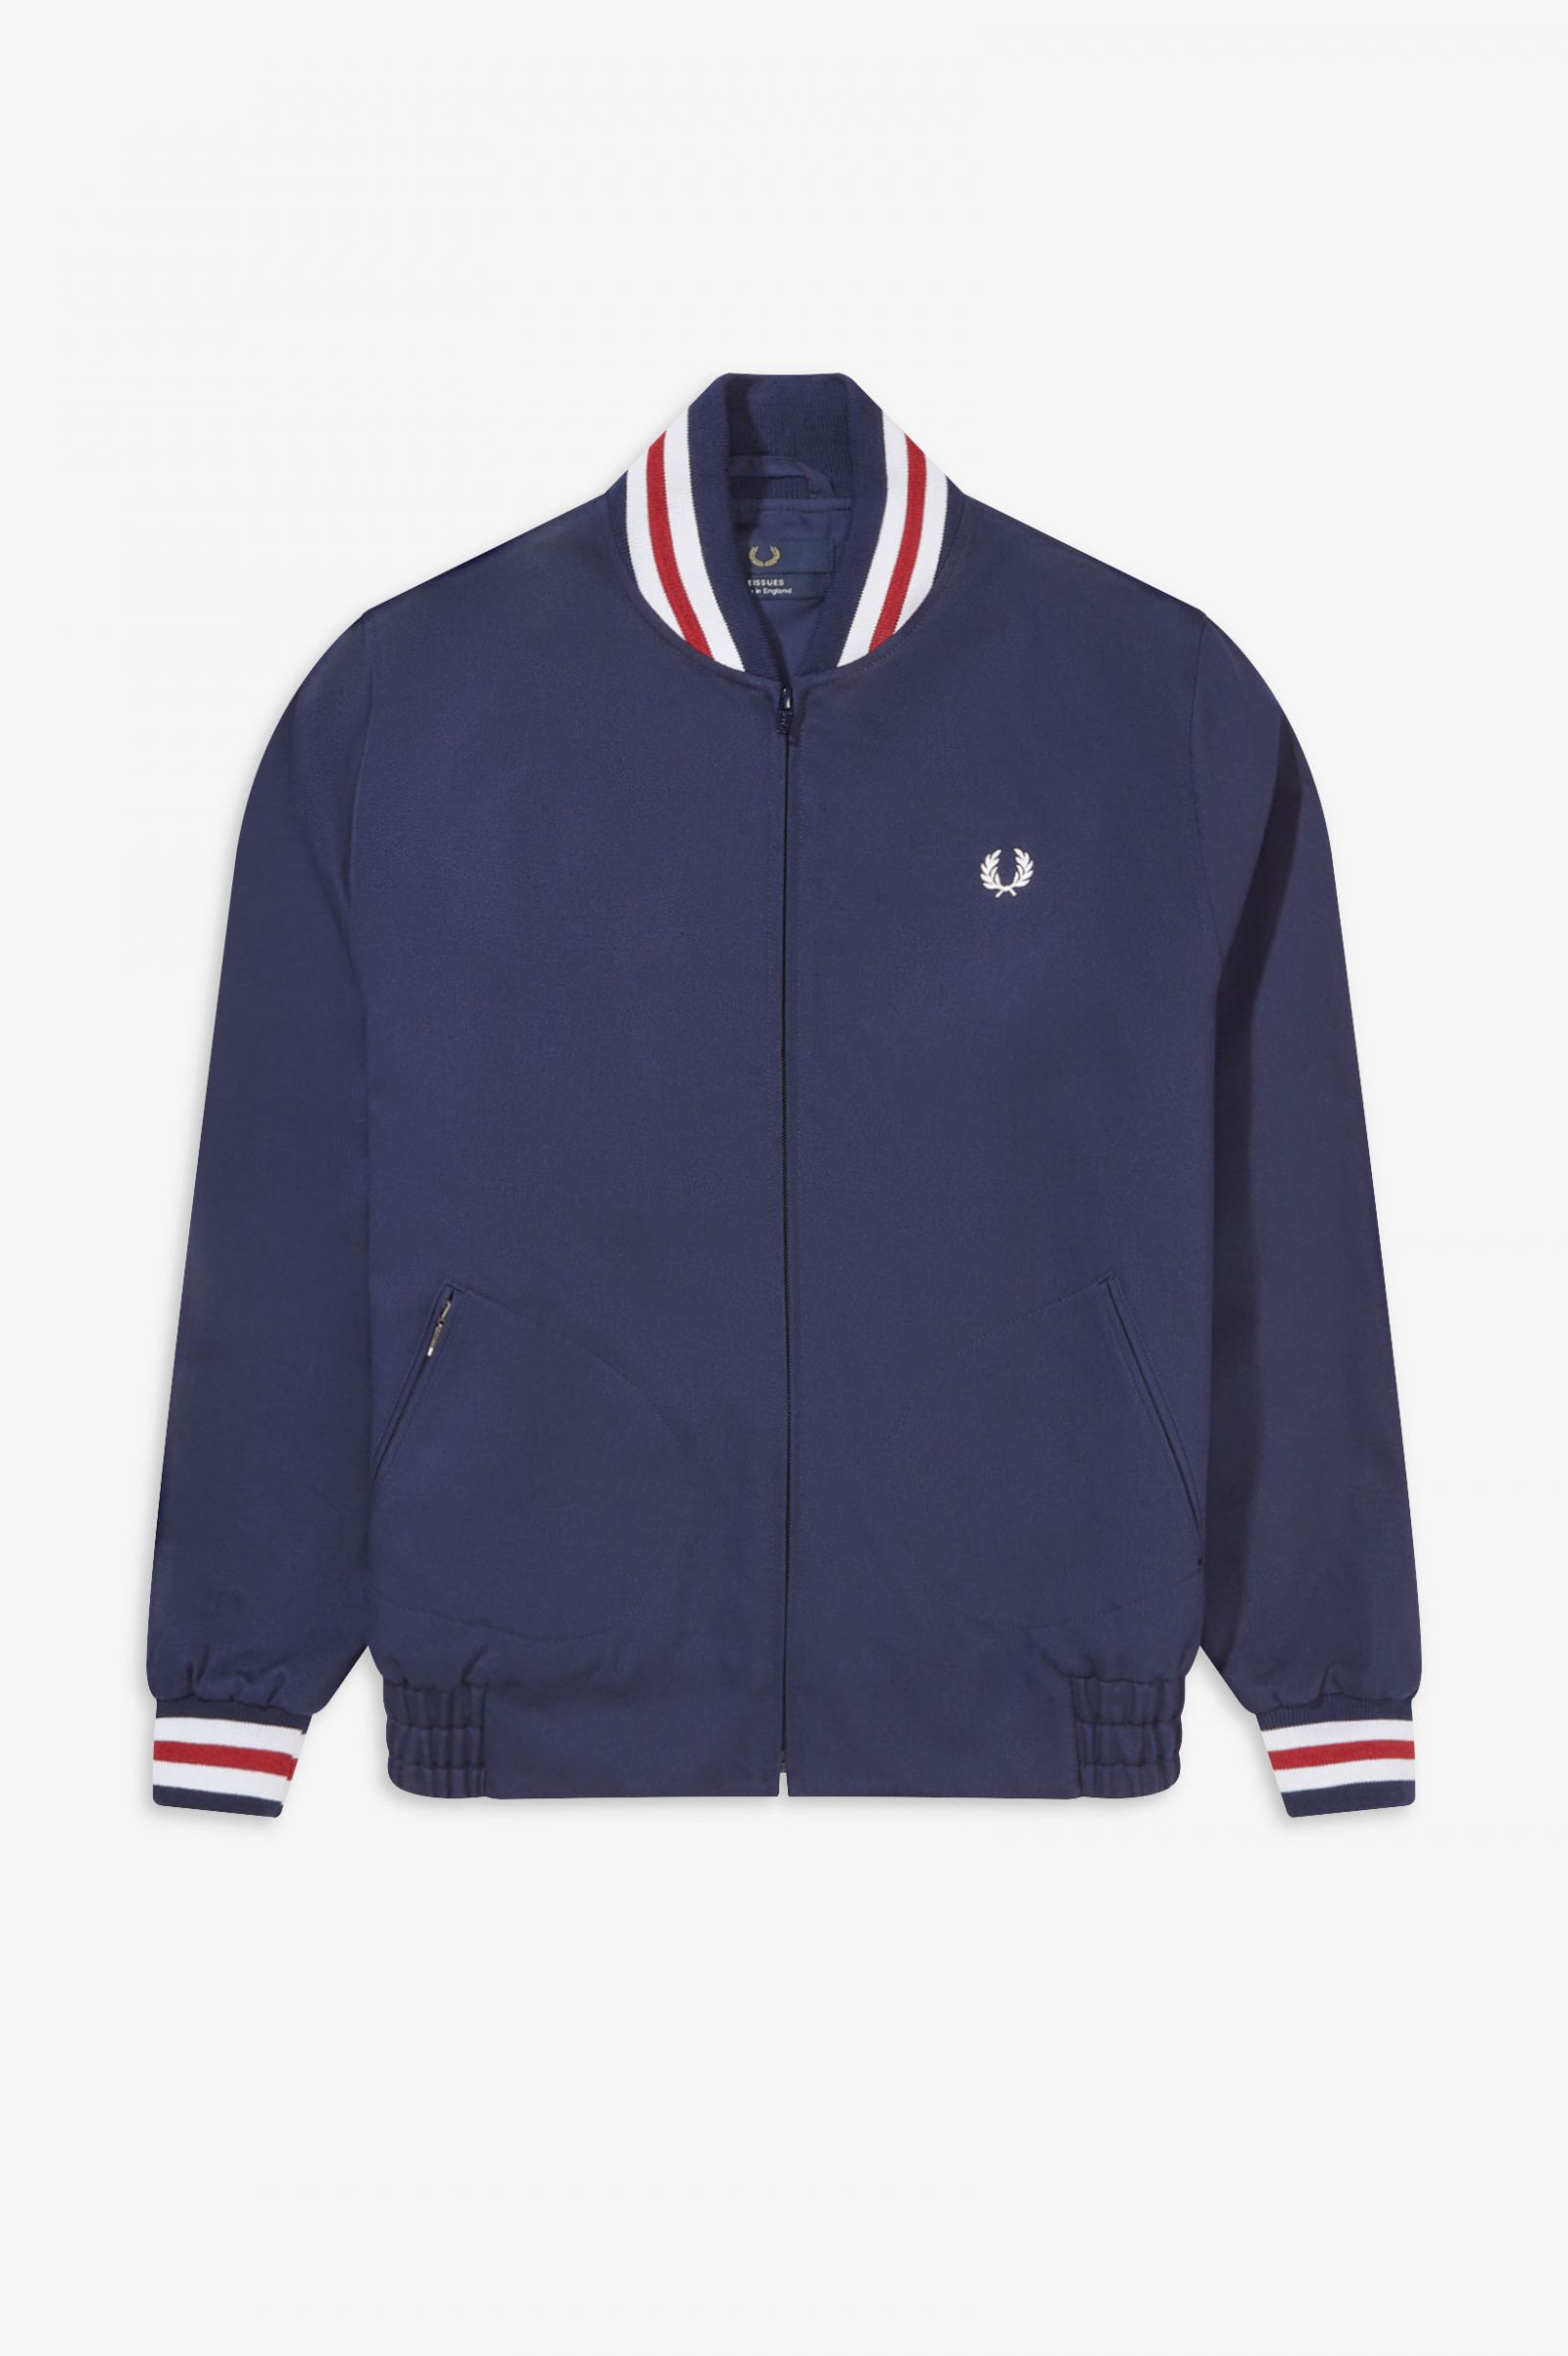 Made in UK Mens Bomber Jacket in Dark Blue Cotton